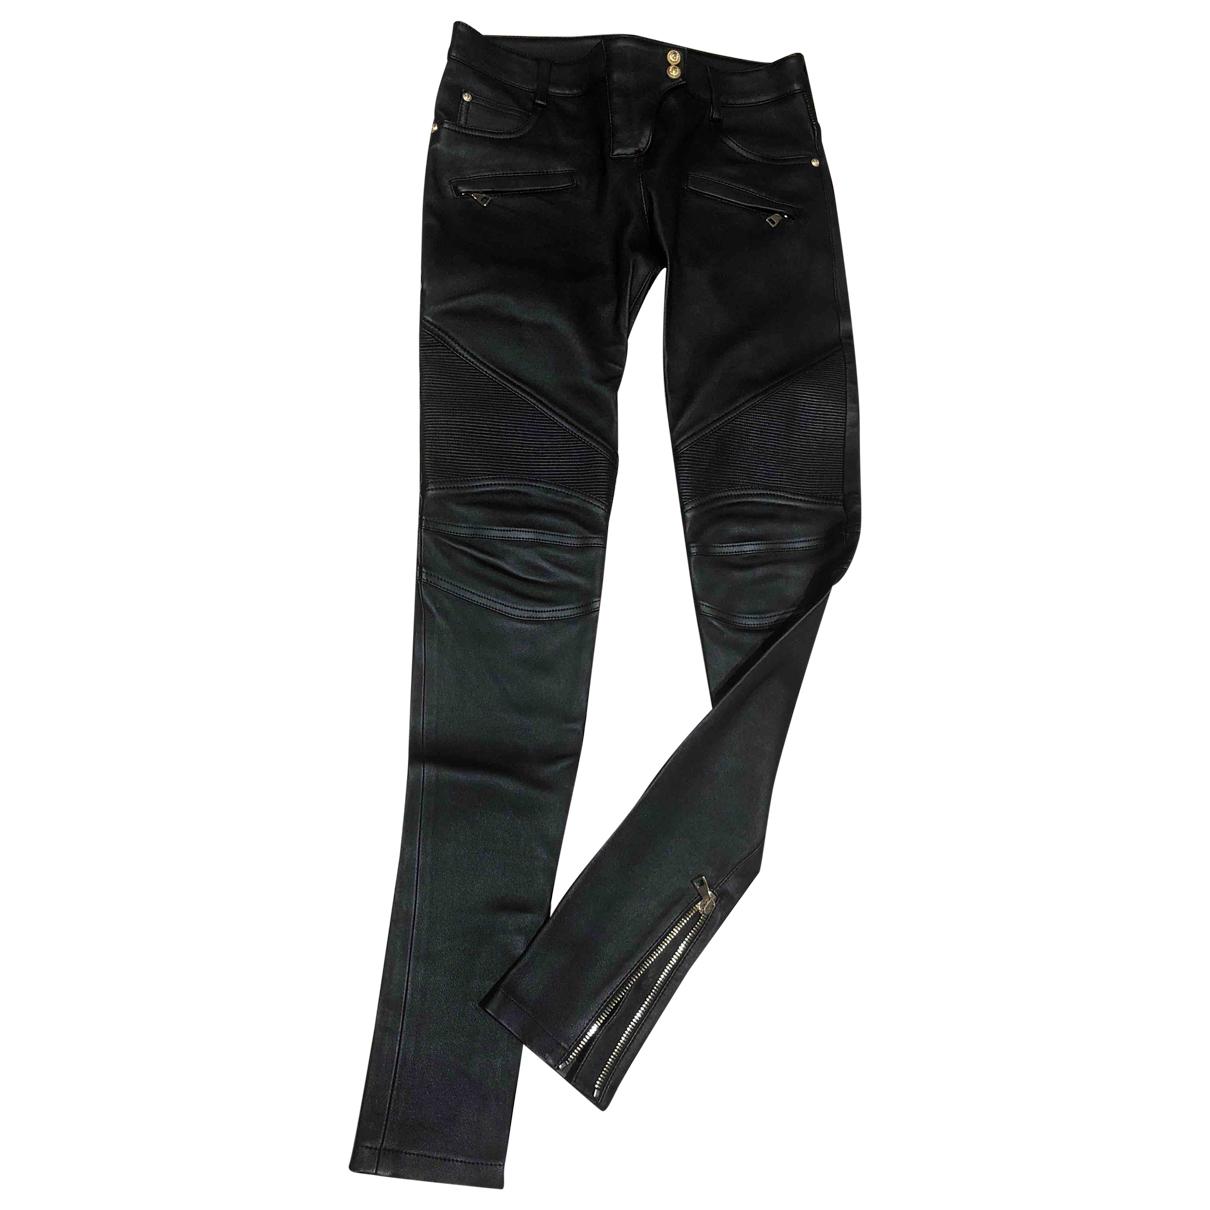 Balmain N Black Leather Trousers for Women 38 FR